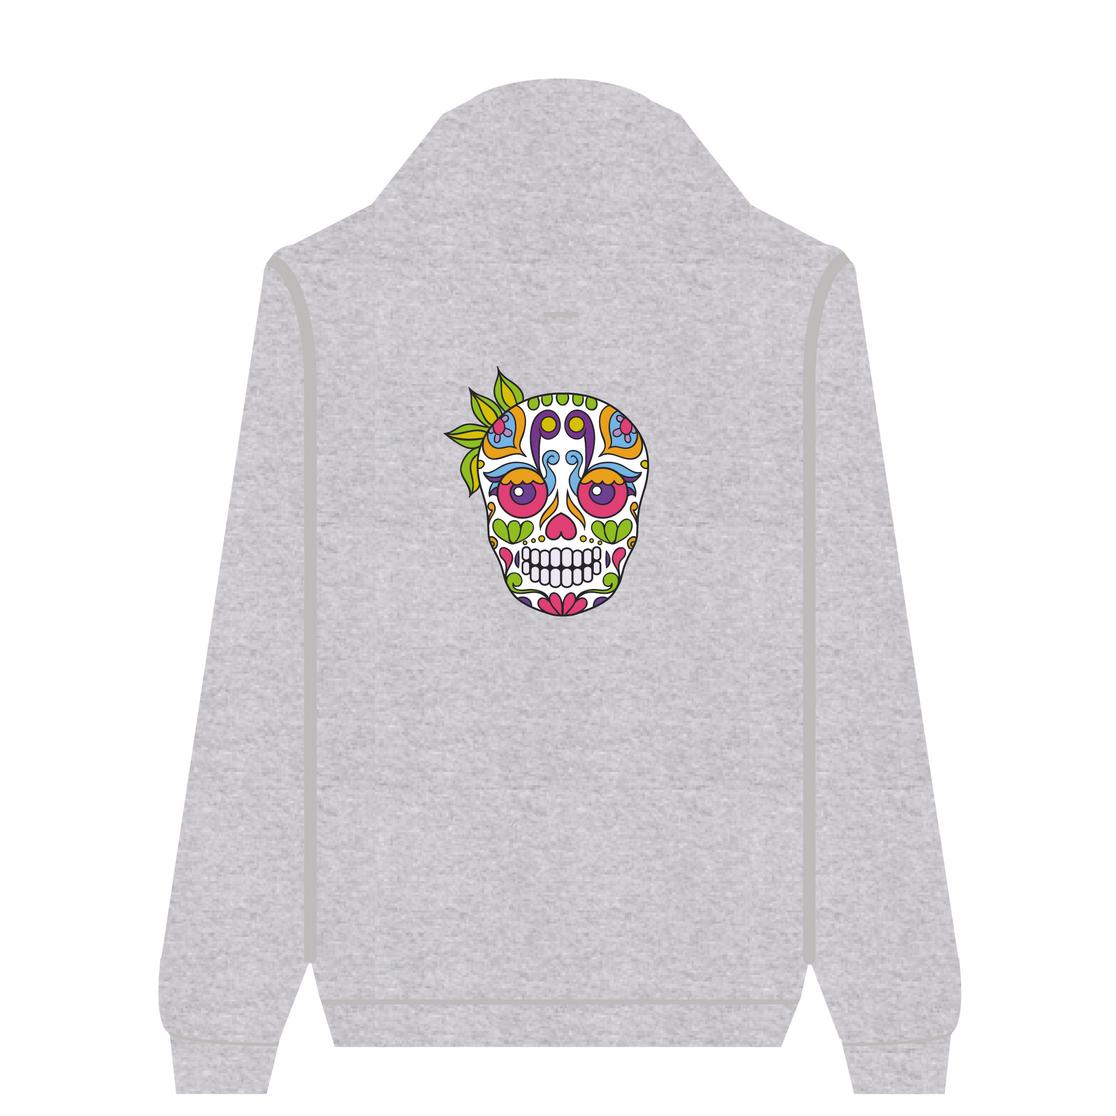 Full Zip Hoodie Ganja Skull | Wuzzee